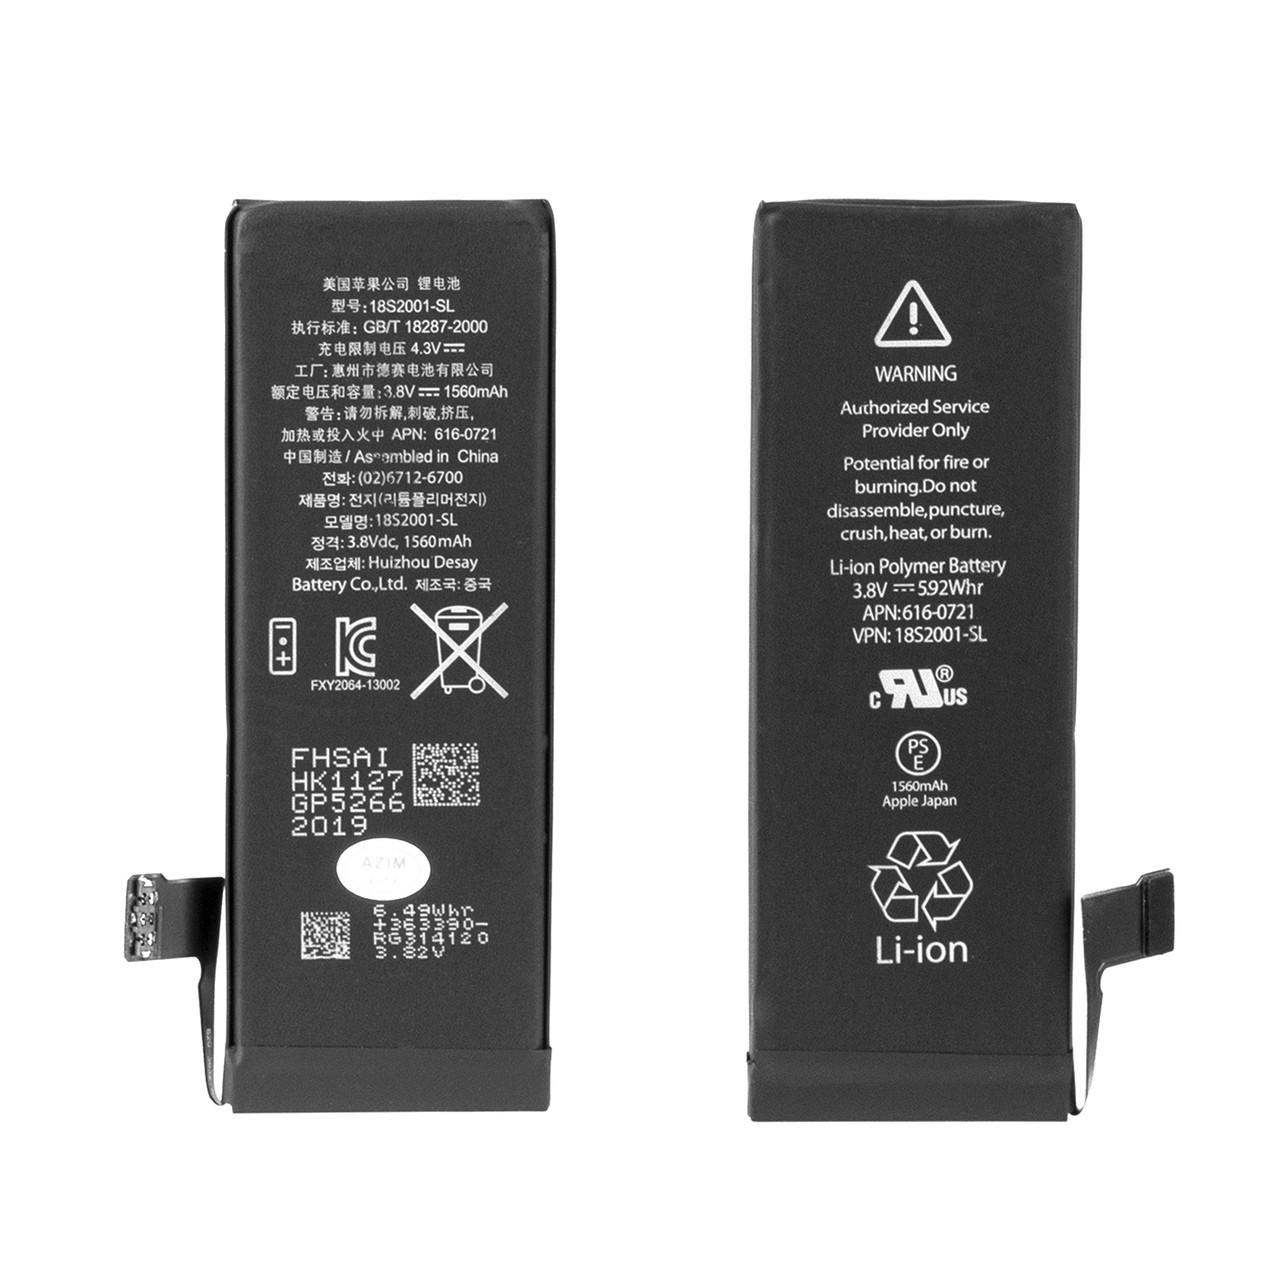 Аккумулятор Apple iPhone 5S 1560mAh Original Double IC V2 plastic box